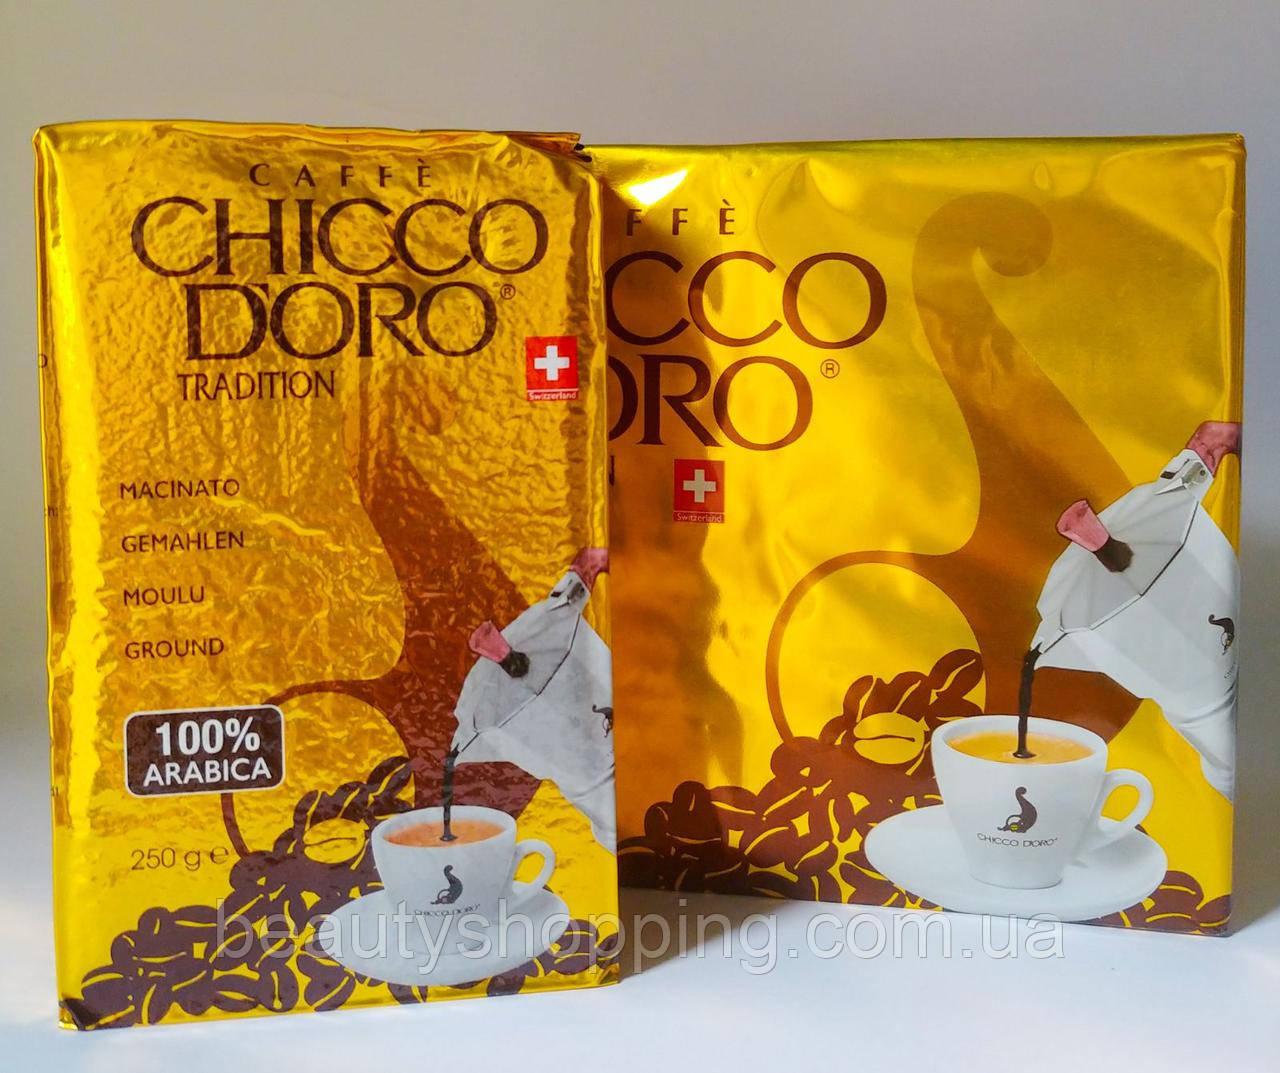 Chicco d'oro Tradition caffe кофе молотый 100% арабика 250 гр